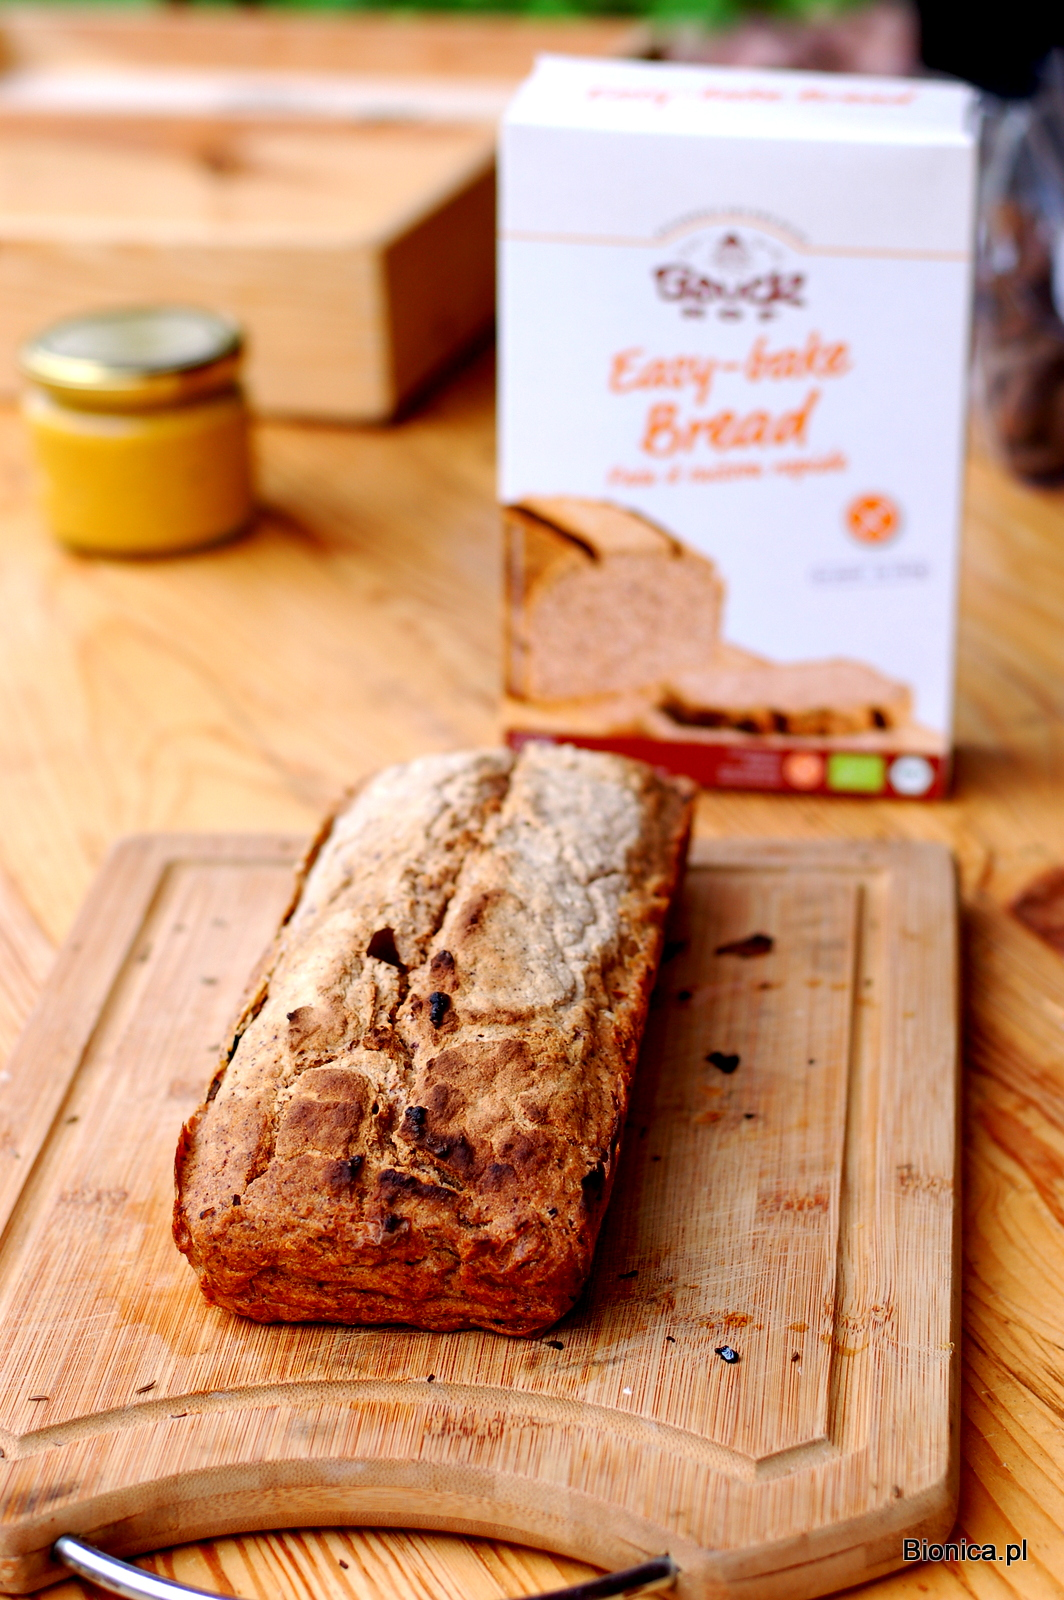 bauckohof bread bionica.pl